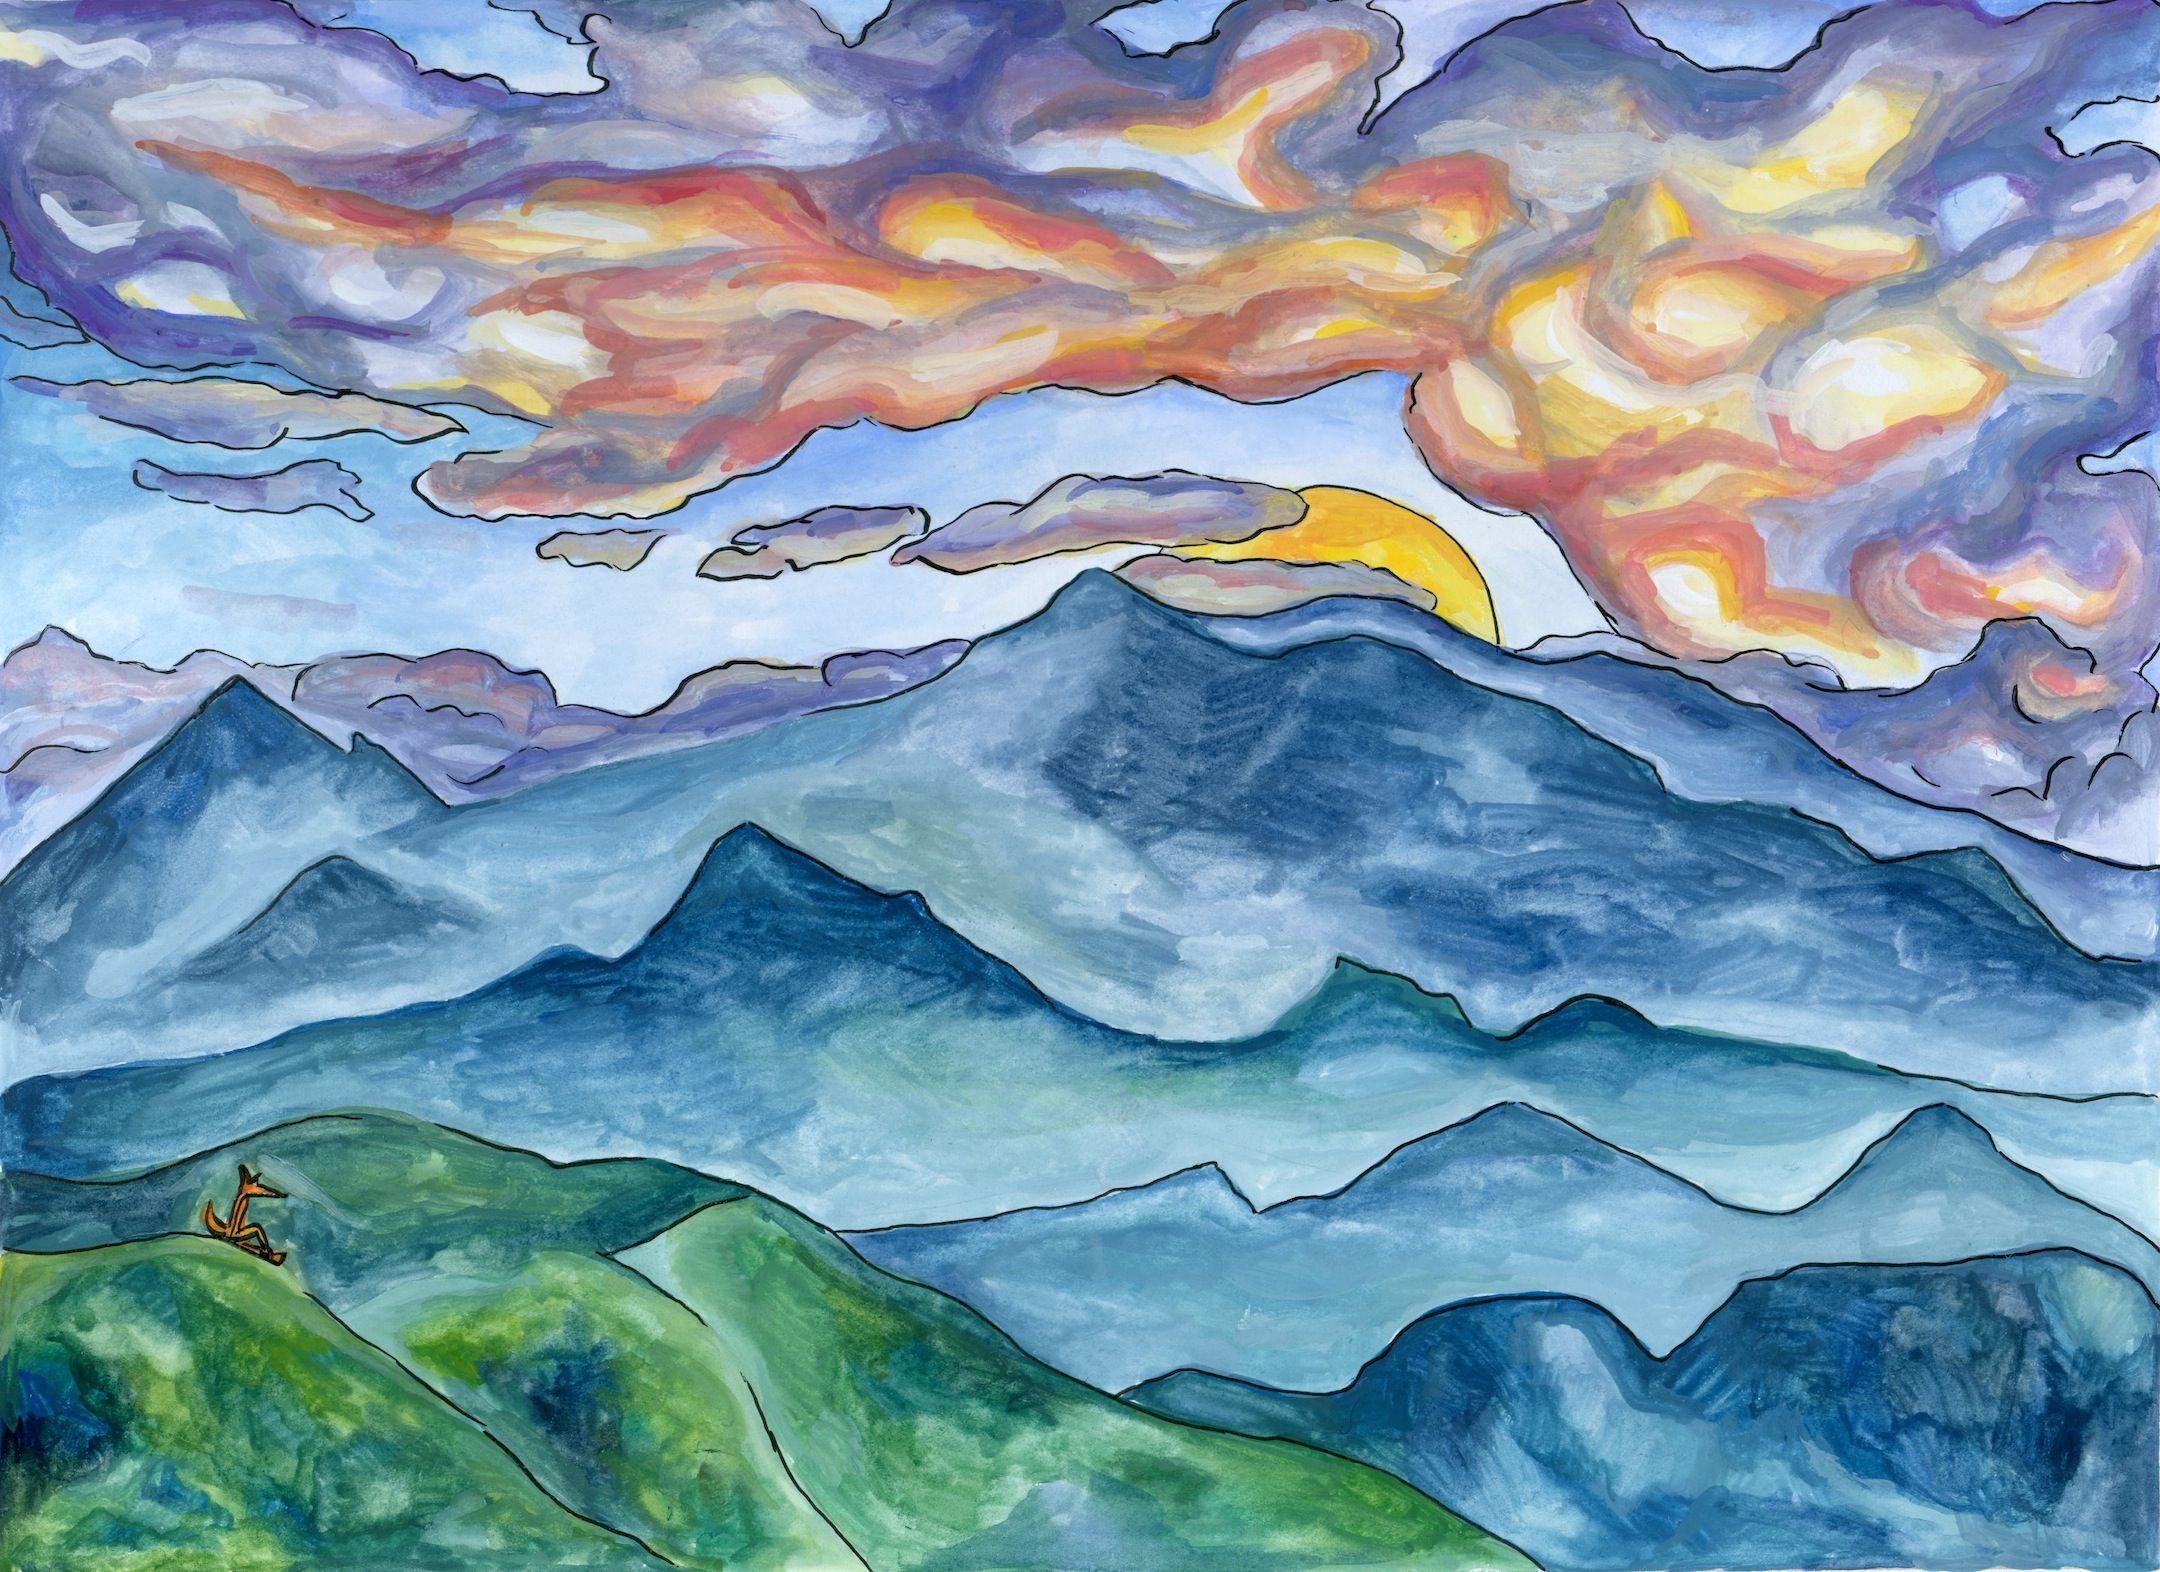 Art, Illustration, Sunset, The Adventure, Children's Book Illustration